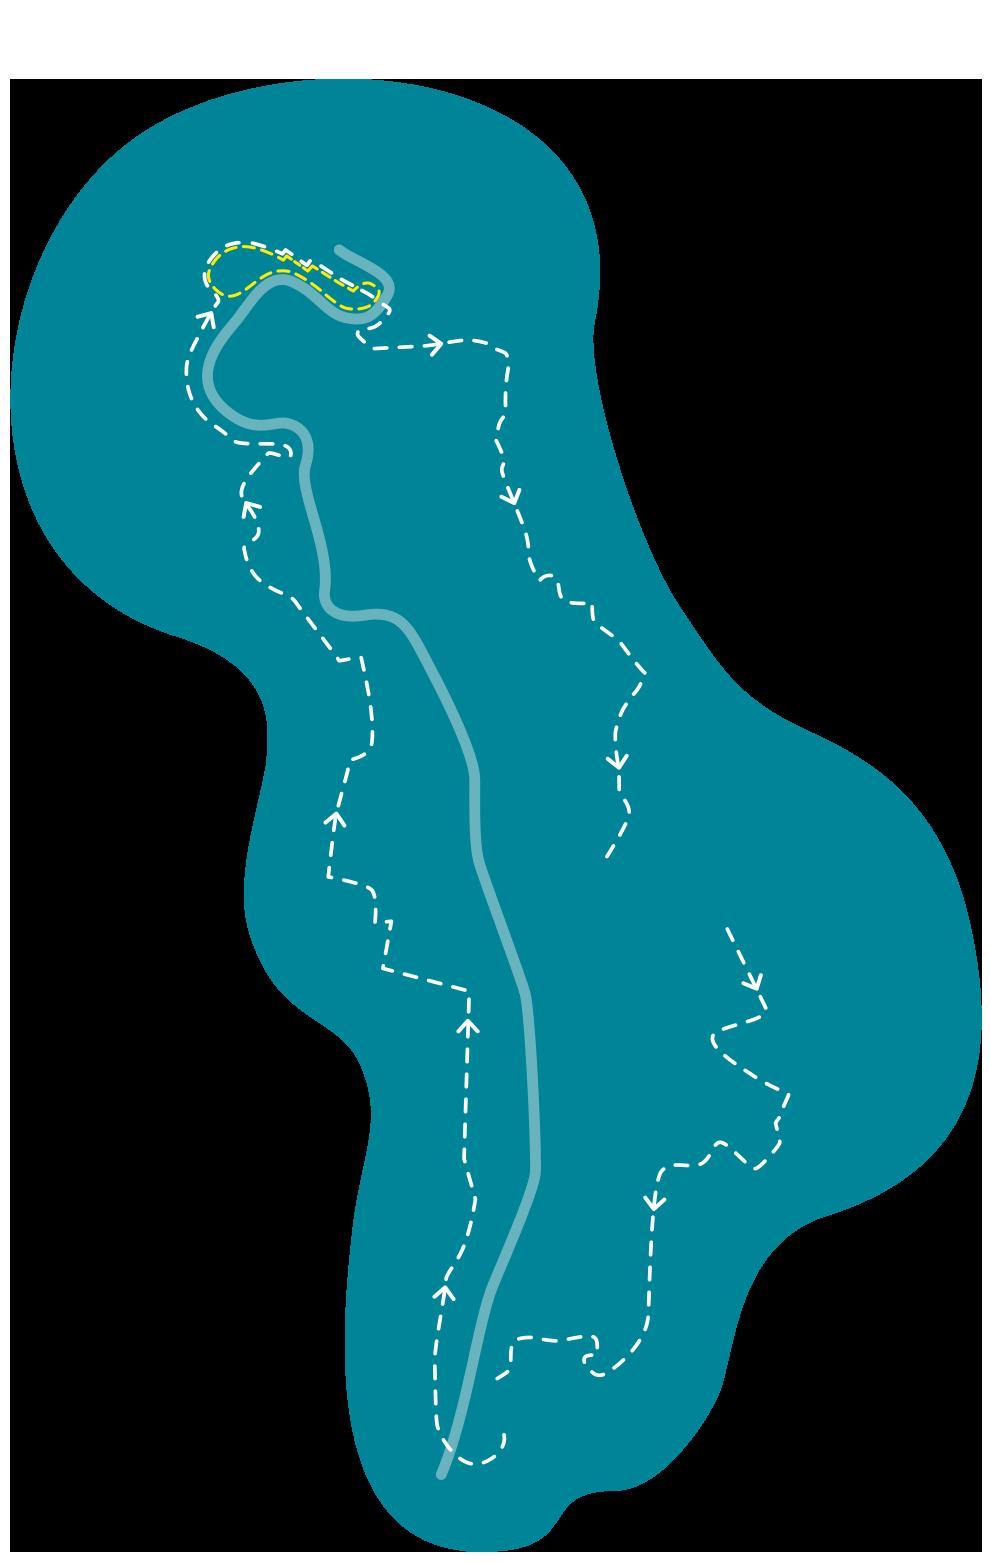 Hallo Velo Strecken Karte